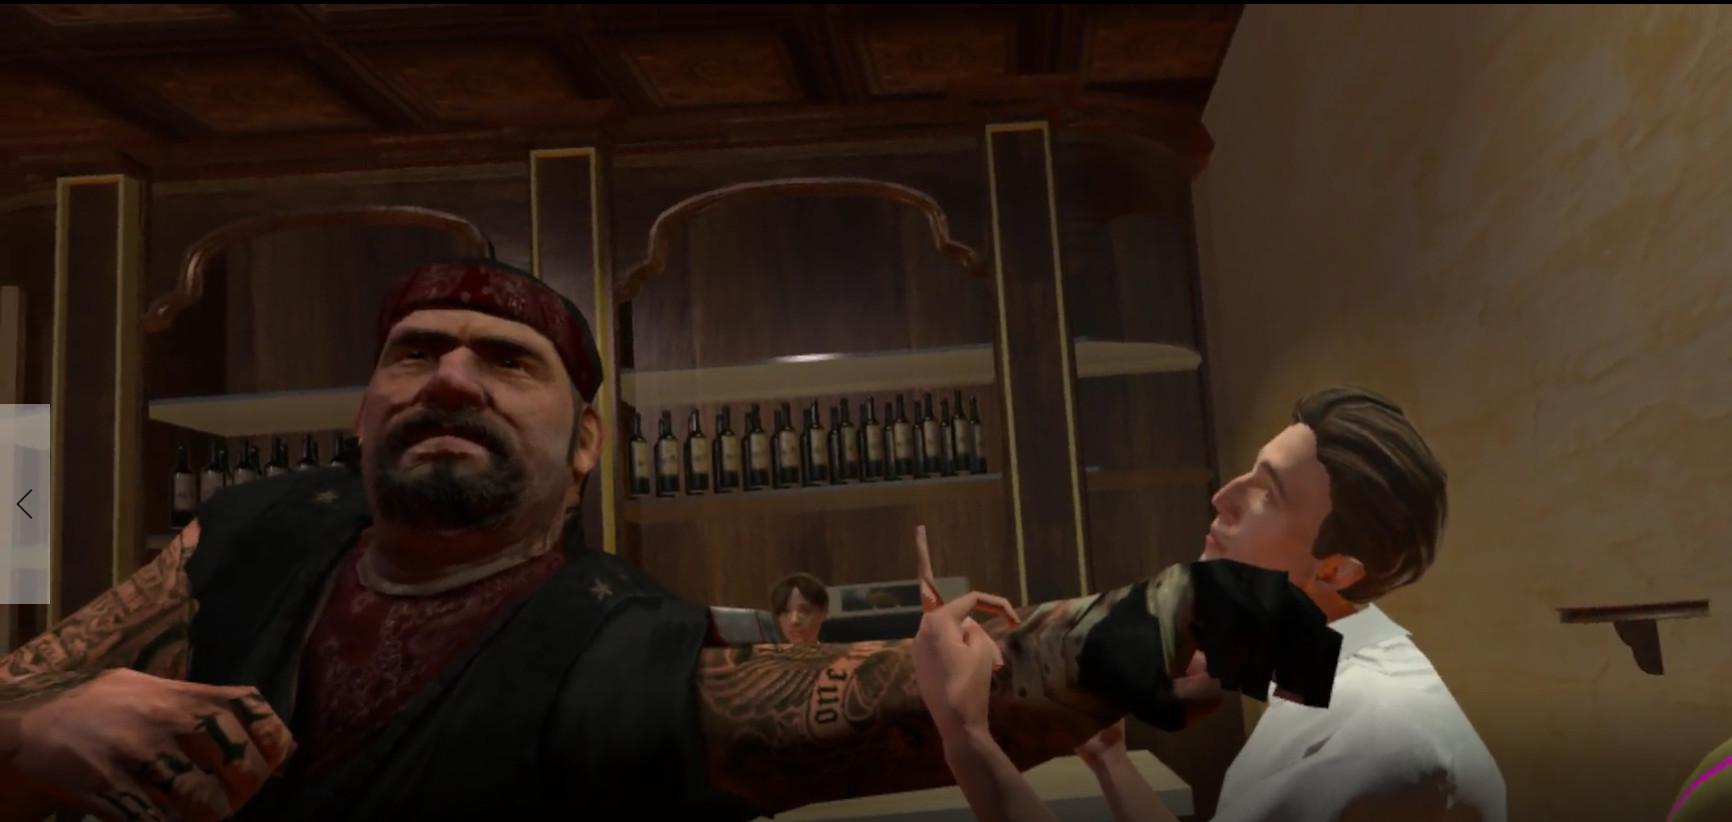 Review - Drunkn Bar Fight (PSVR)